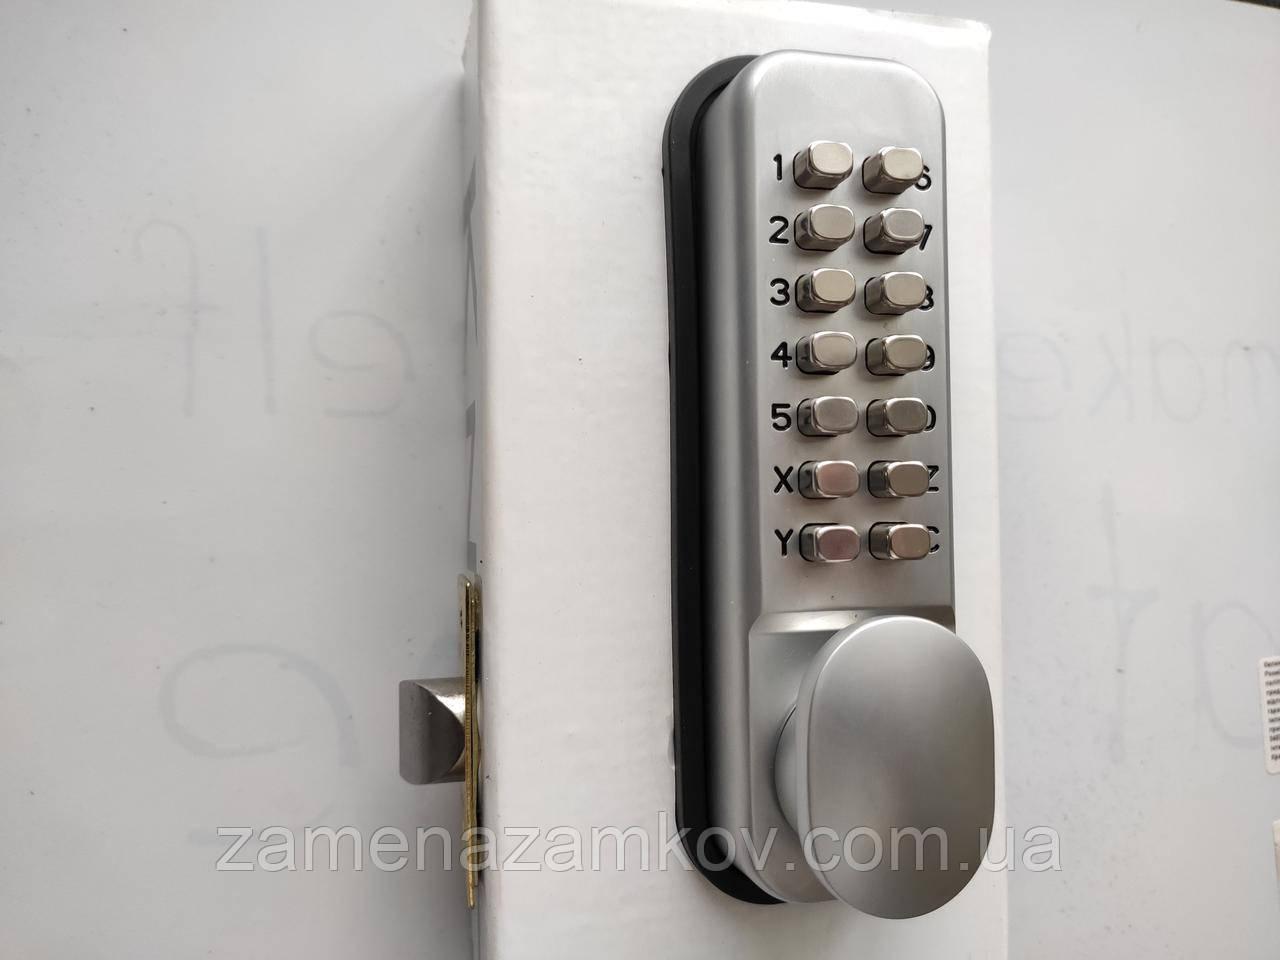 Акция! Кодовый замок Lockod для любых дверей аналог  LOCKY 20-S